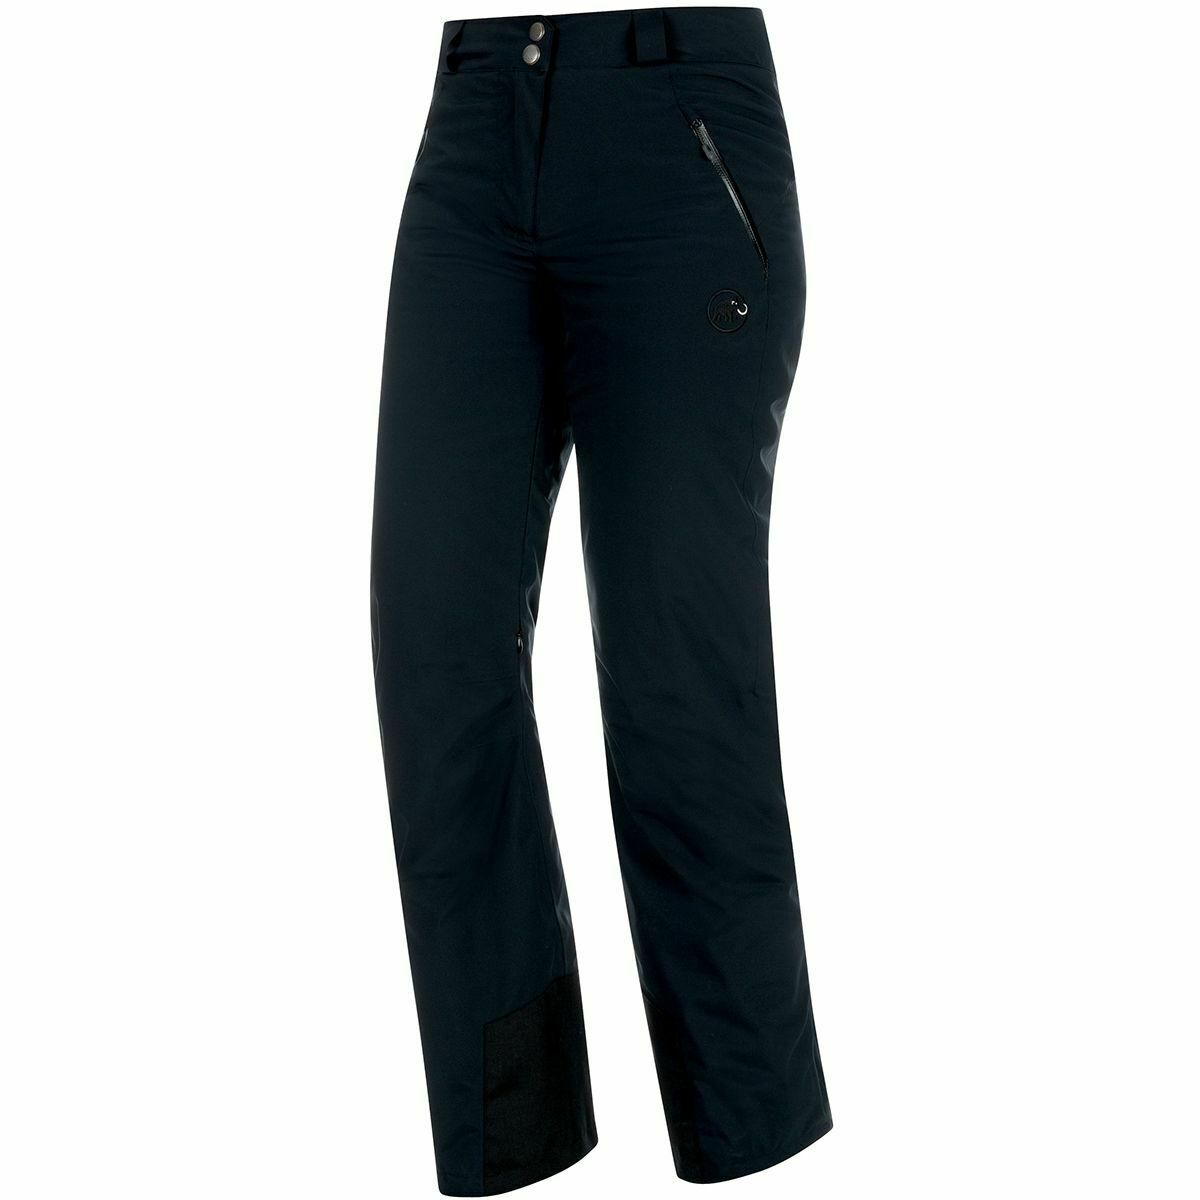 NEW Mammut Nara HS Pants Women (Hardshell Pants) Walking Skiing Size 10 UK